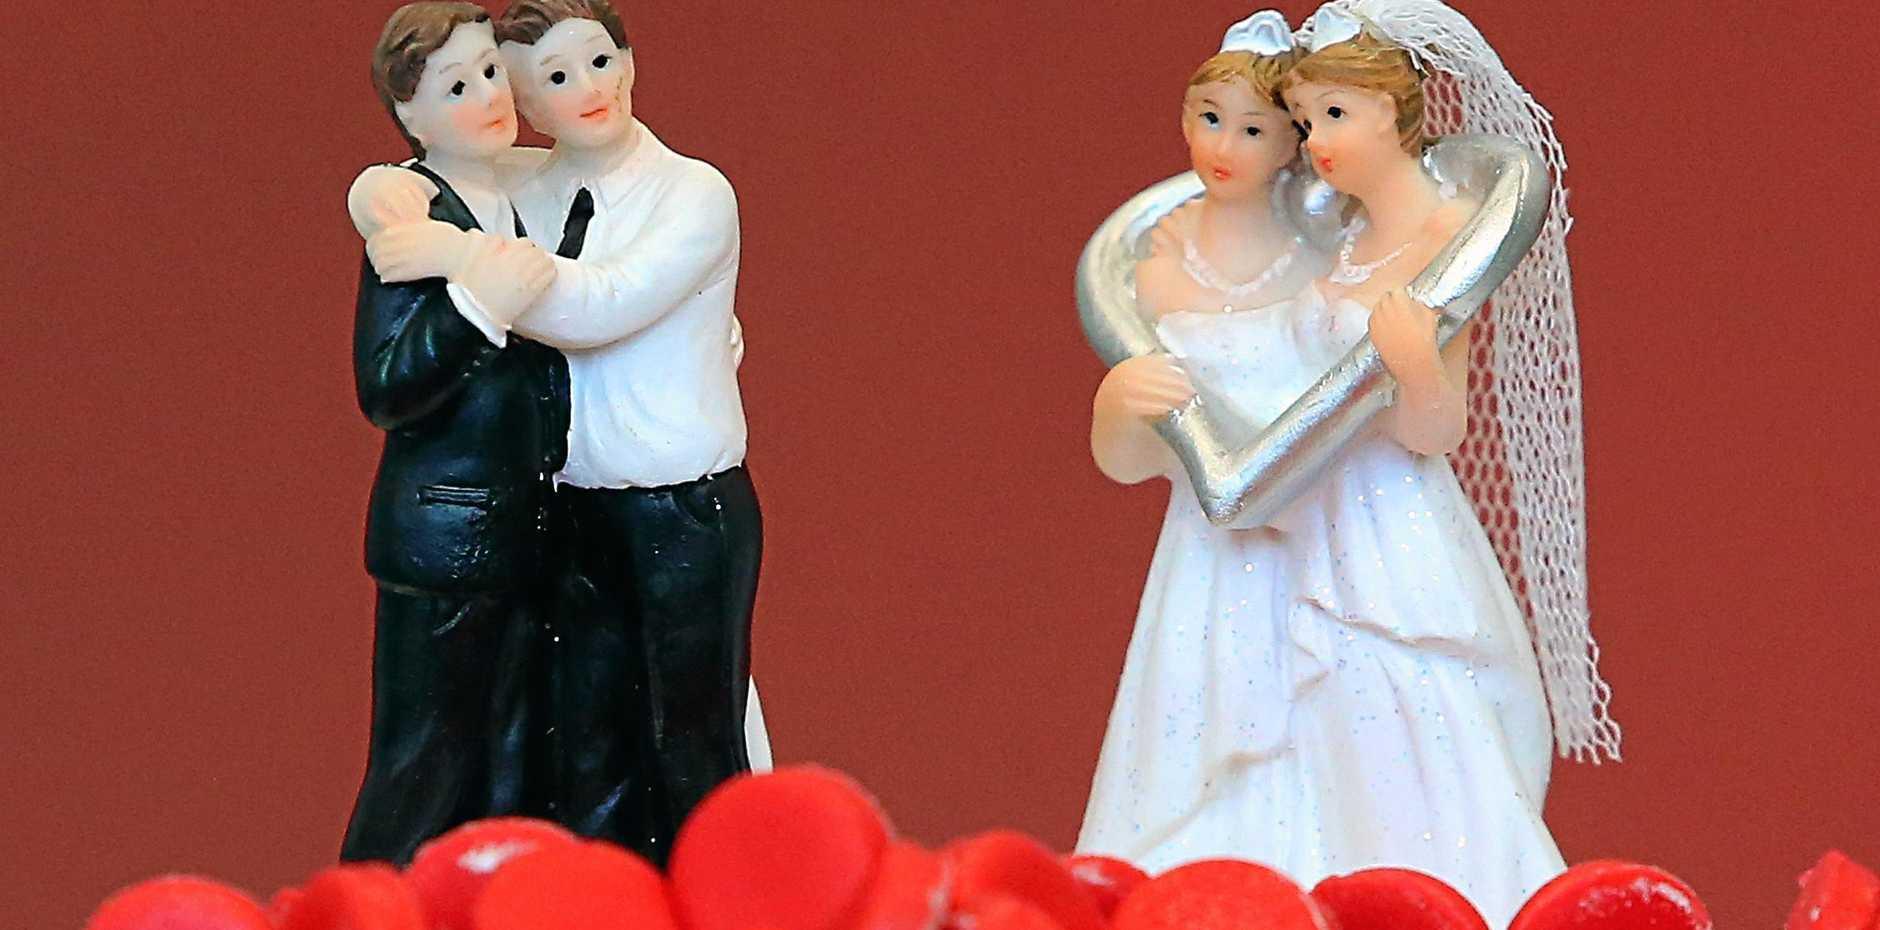 Debate is still raging about same sex marriage.